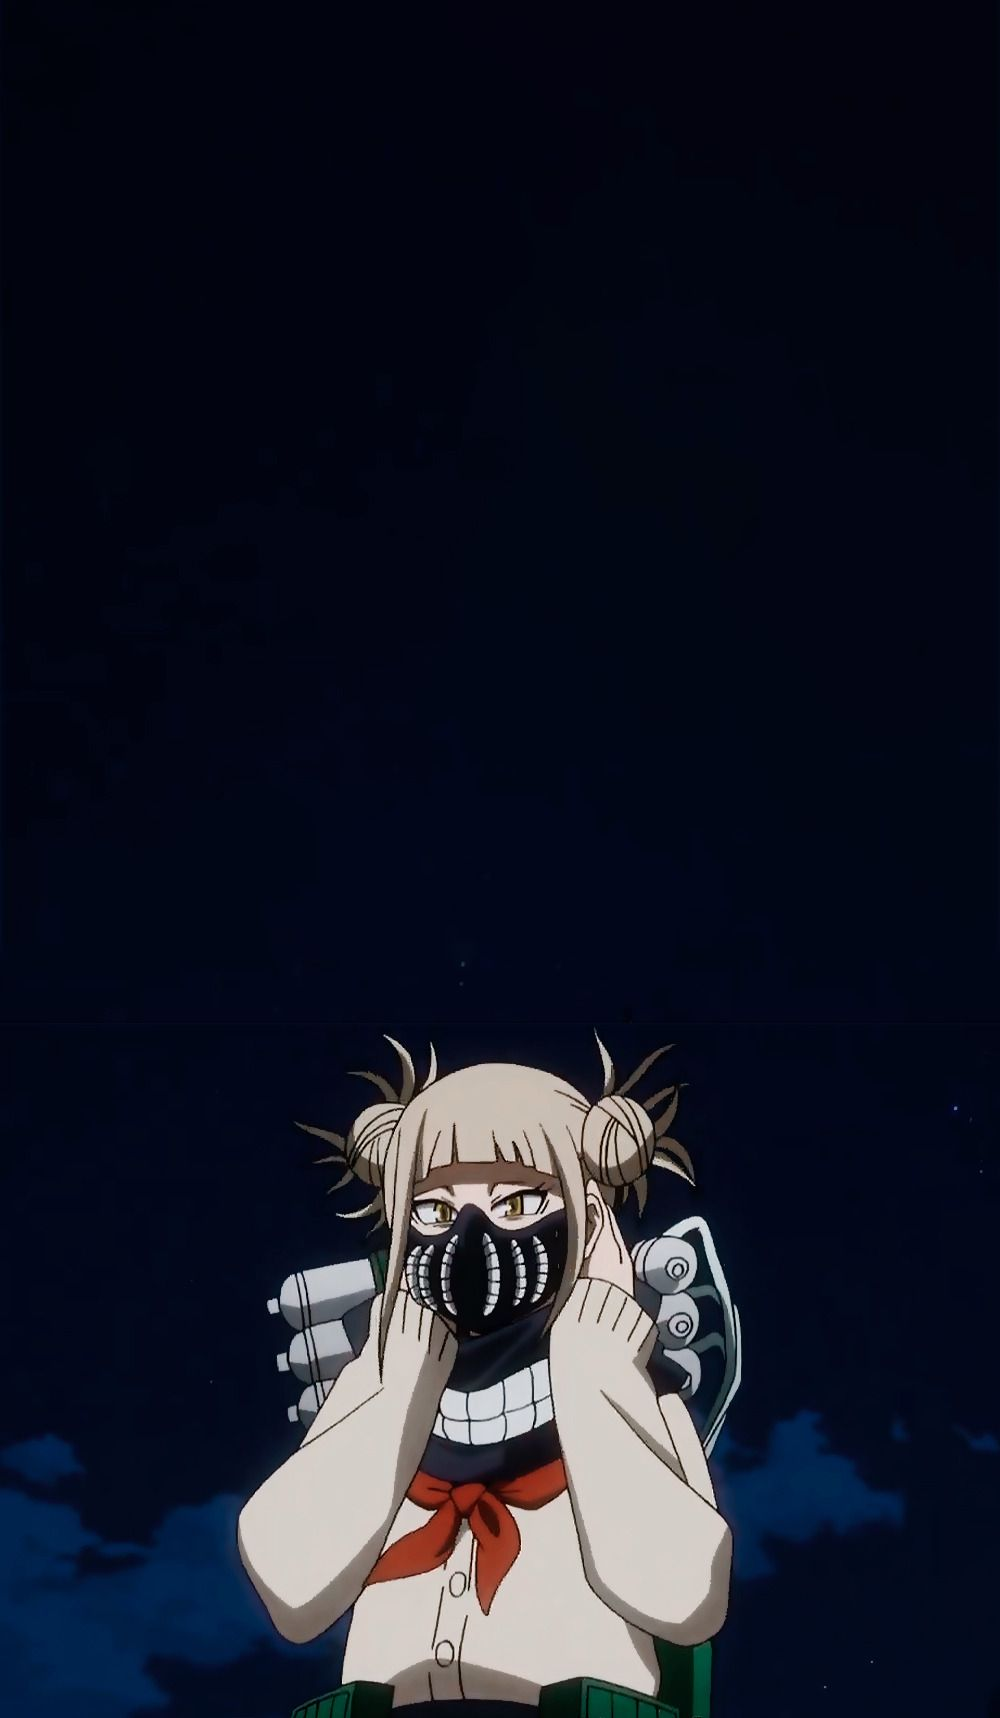 Himiko Wallpaper Hero Wallpaper Anime Wallpaper Anime Wallpaper Iphone